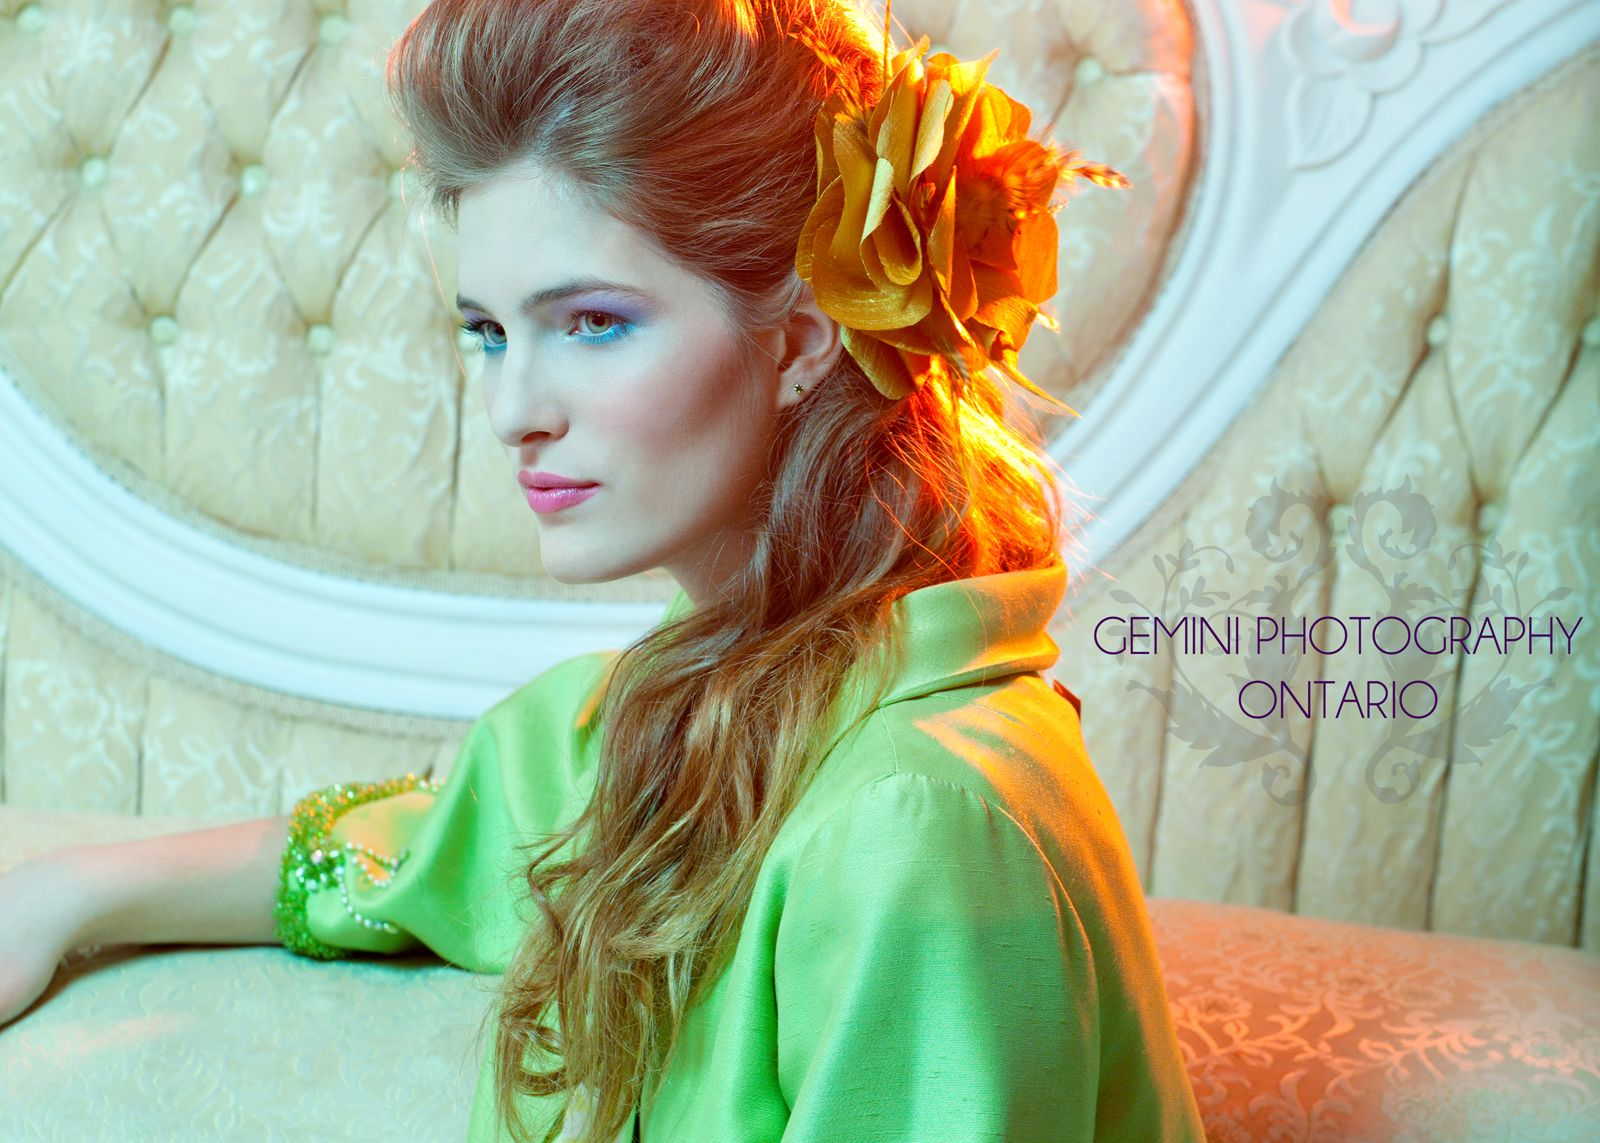 Gemini Photography Ontario - by Angela Y. Martin